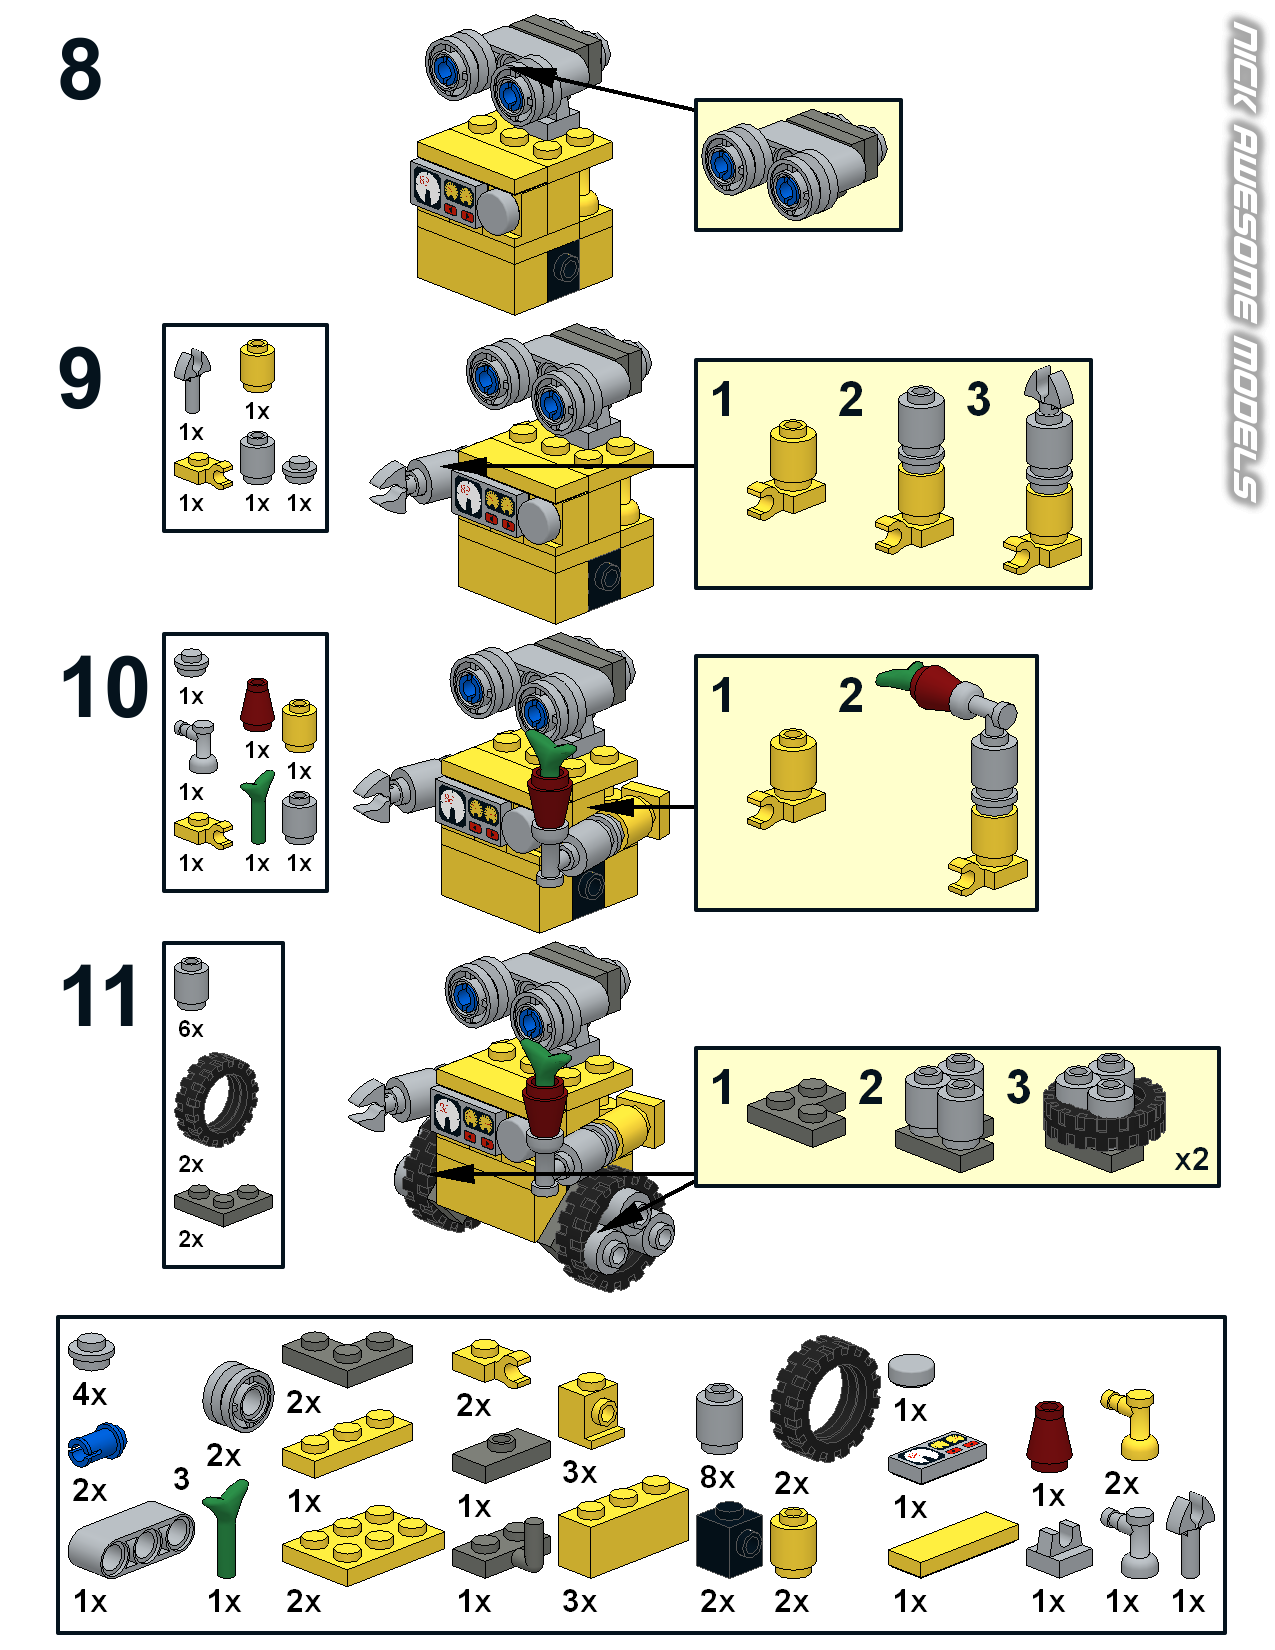 bricksafe msx 39 s lego pages lego pinterest lego lego anleitung und lego ideen. Black Bedroom Furniture Sets. Home Design Ideas